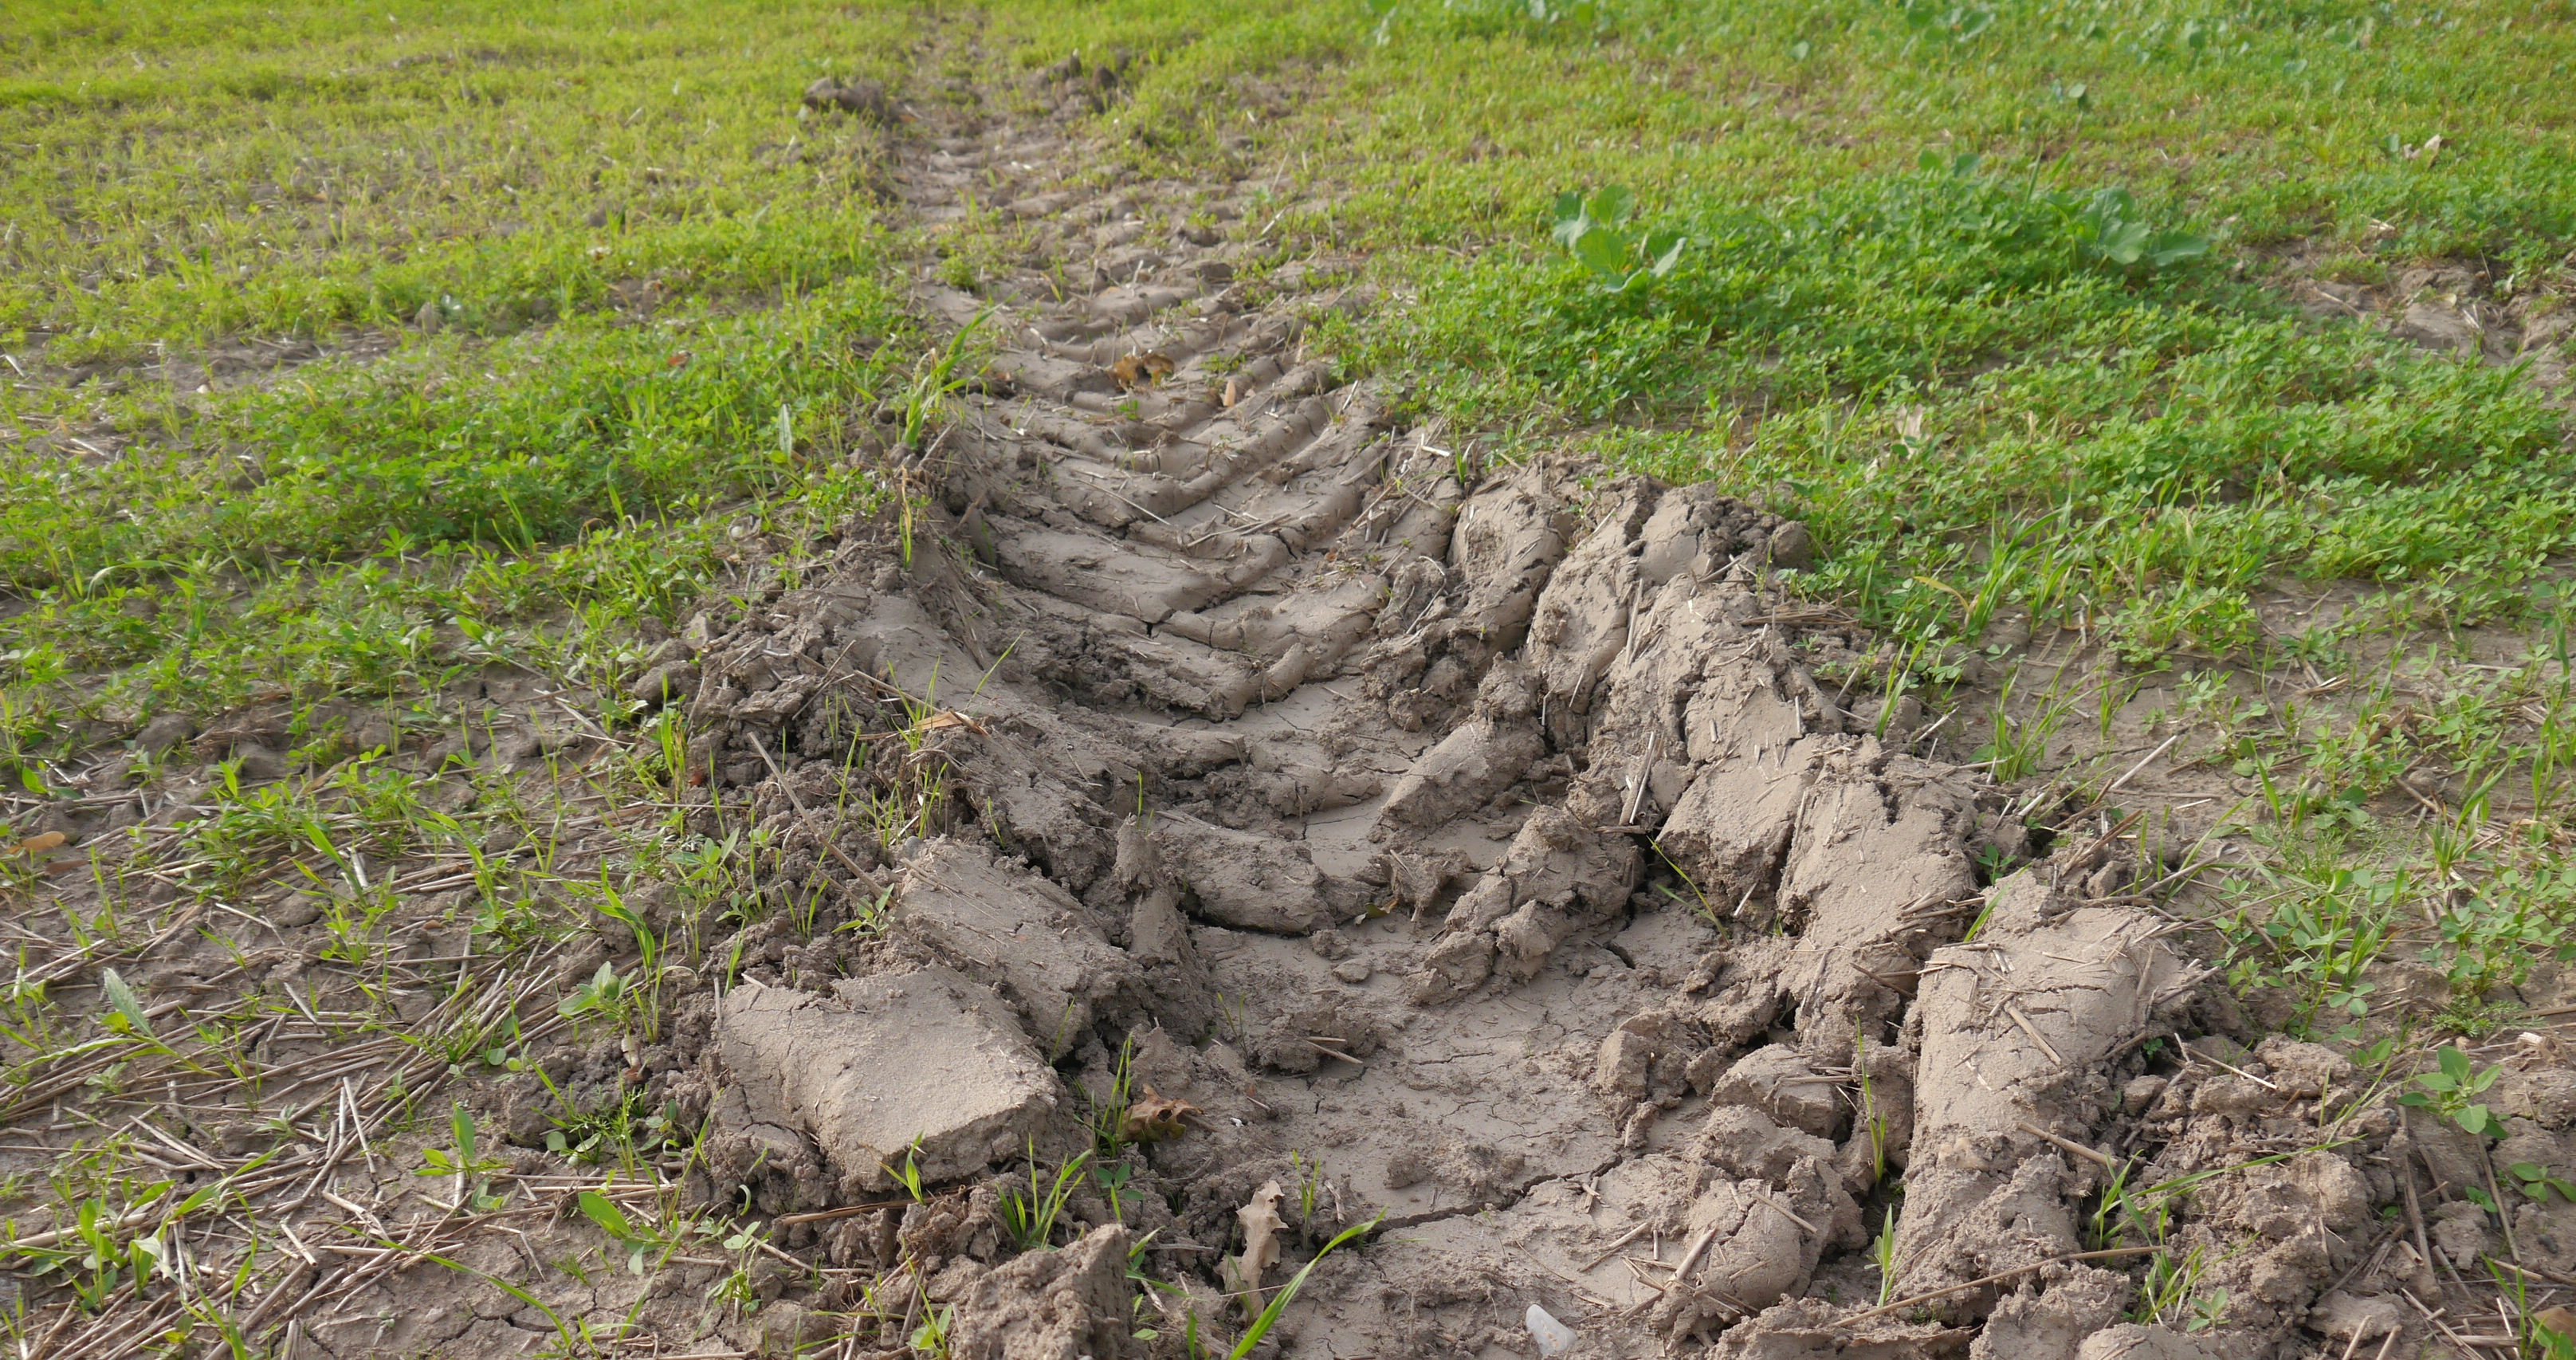 Soil compaction umweltbundesamt for Boden bilder